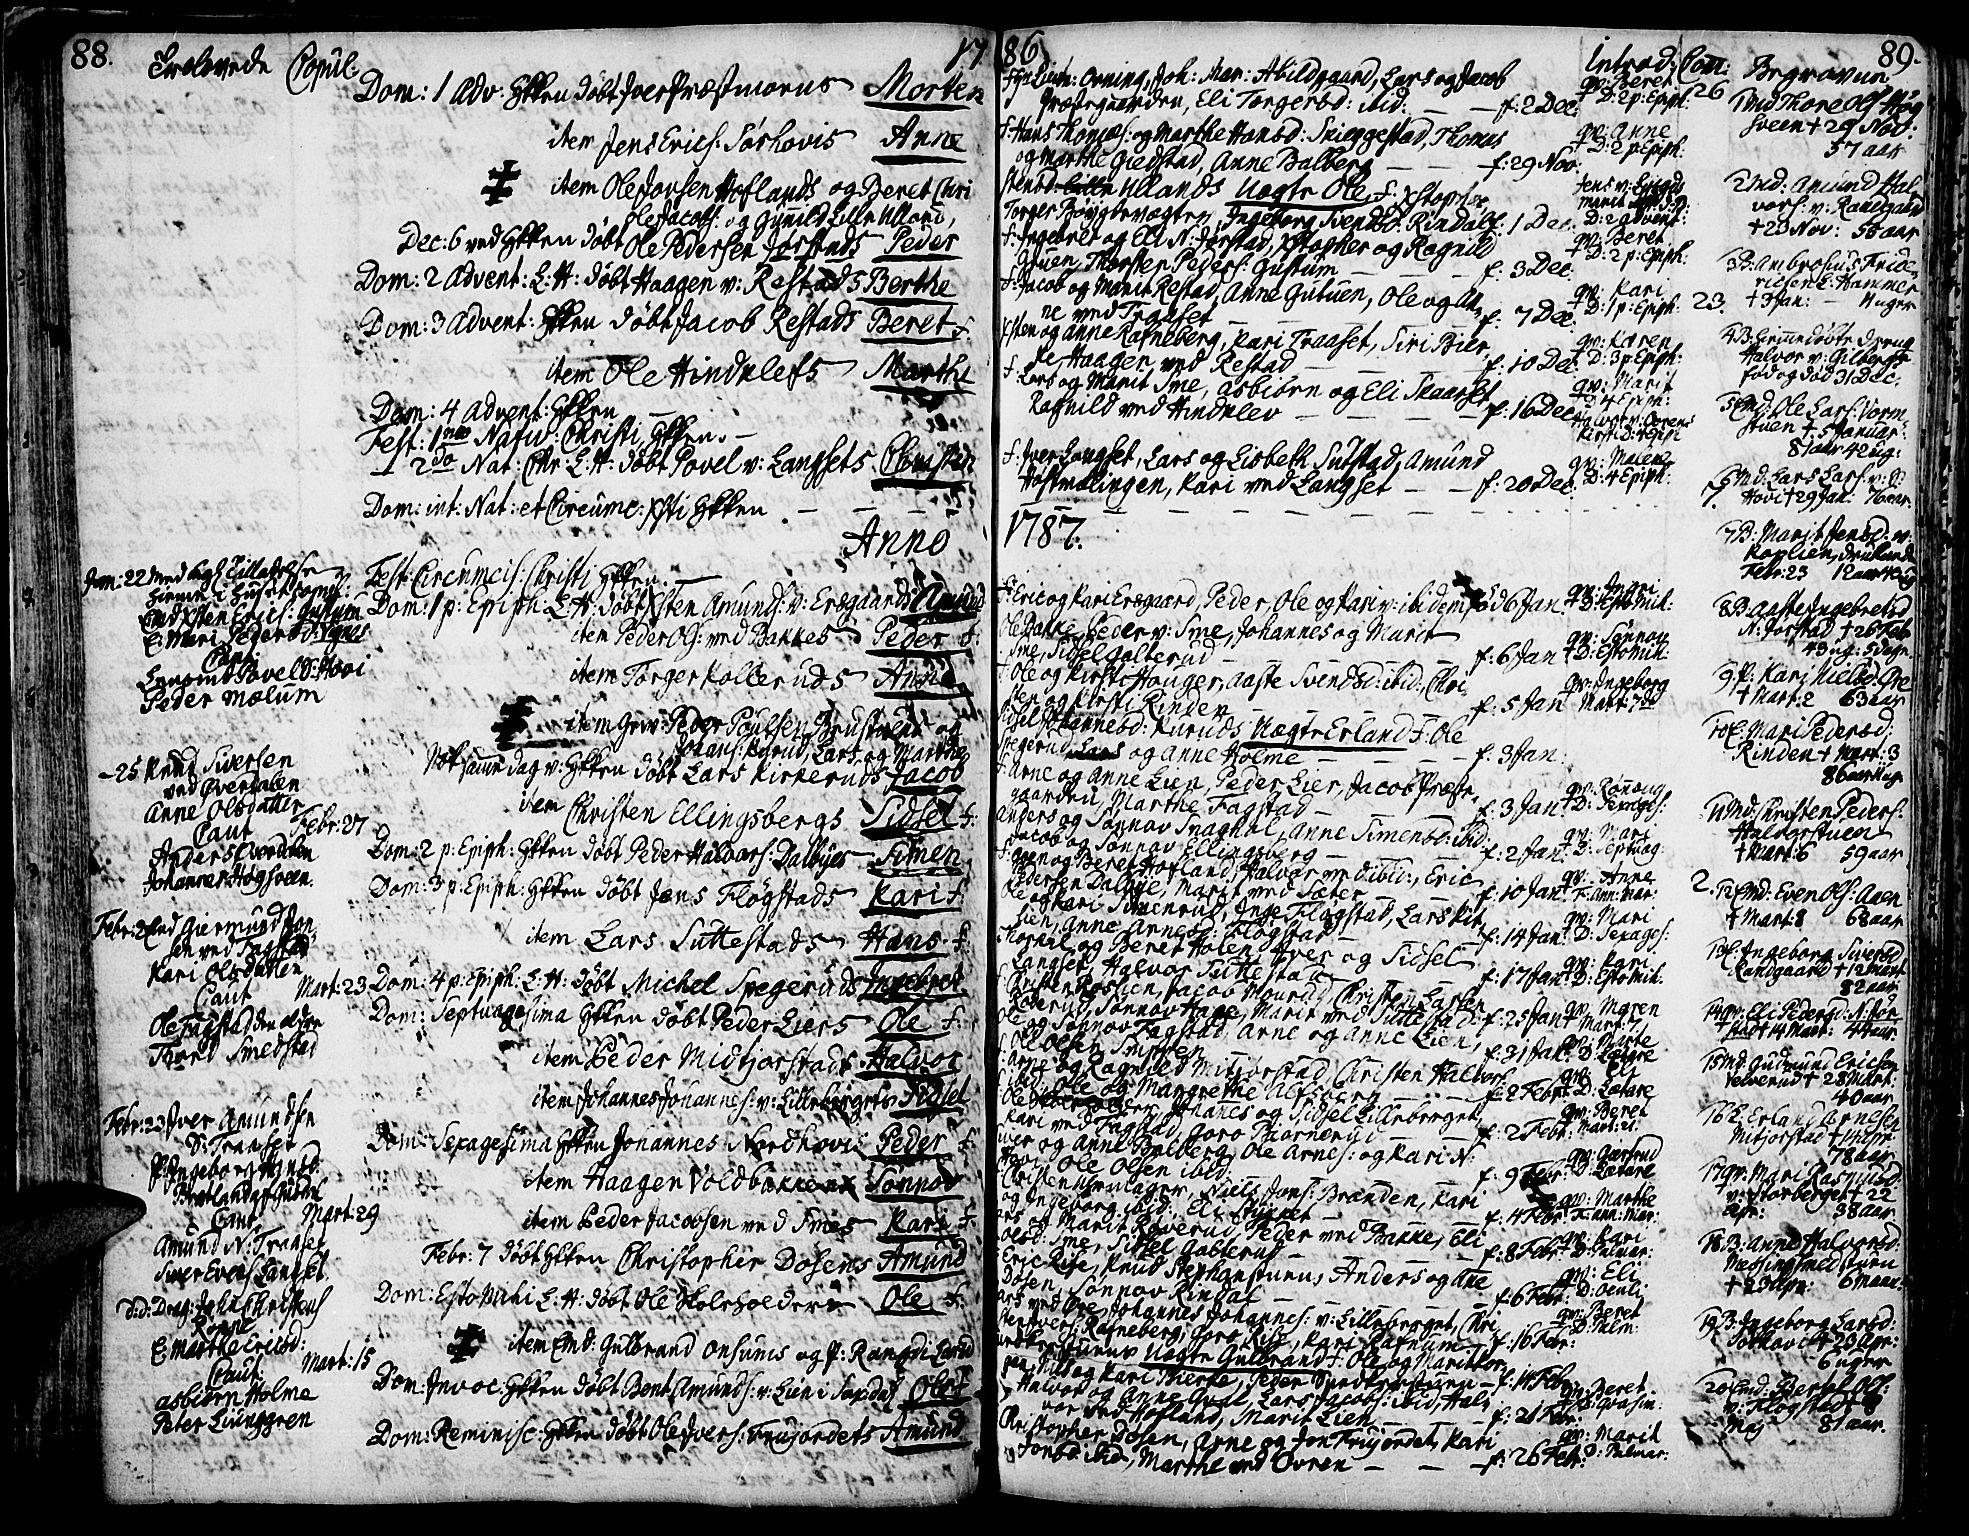 SAH, Fåberg prestekontor, Ministerialbok nr. 2, 1775-1818, s. 88-89